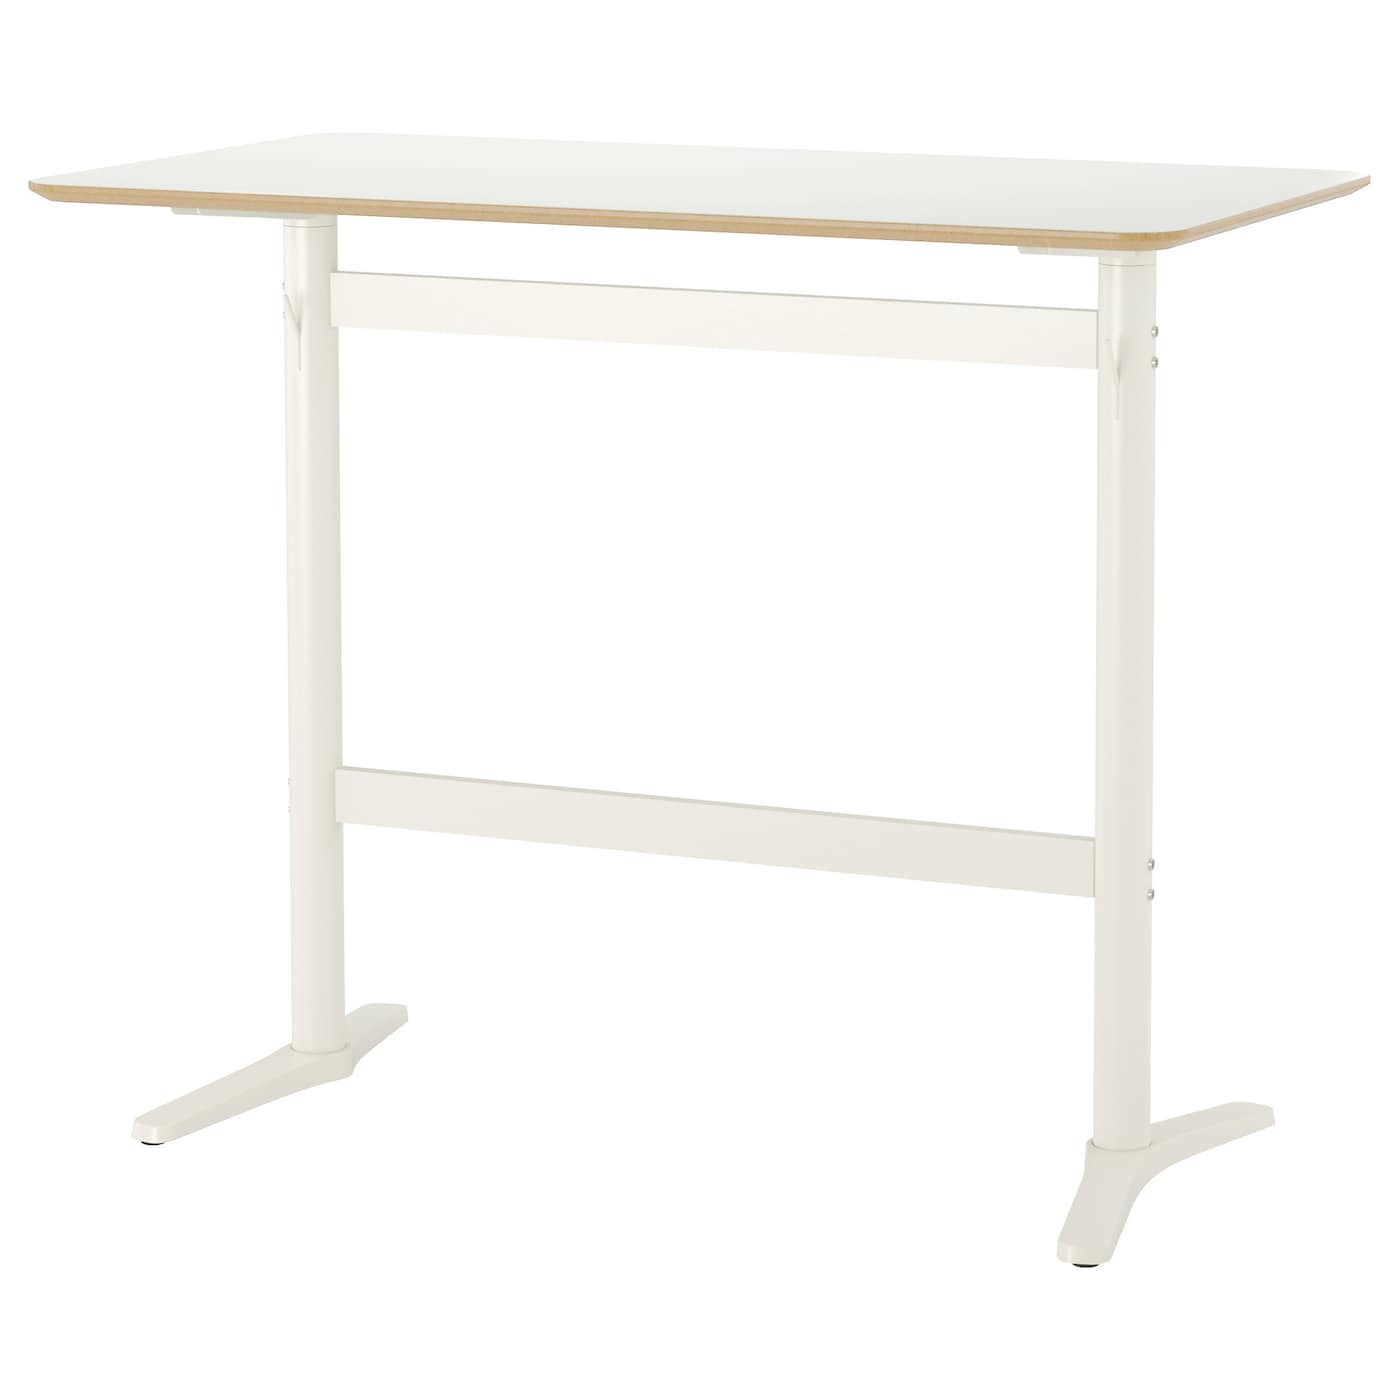 Billsta bar table white white 130x70 cm ikea for Ikea divanetti bar